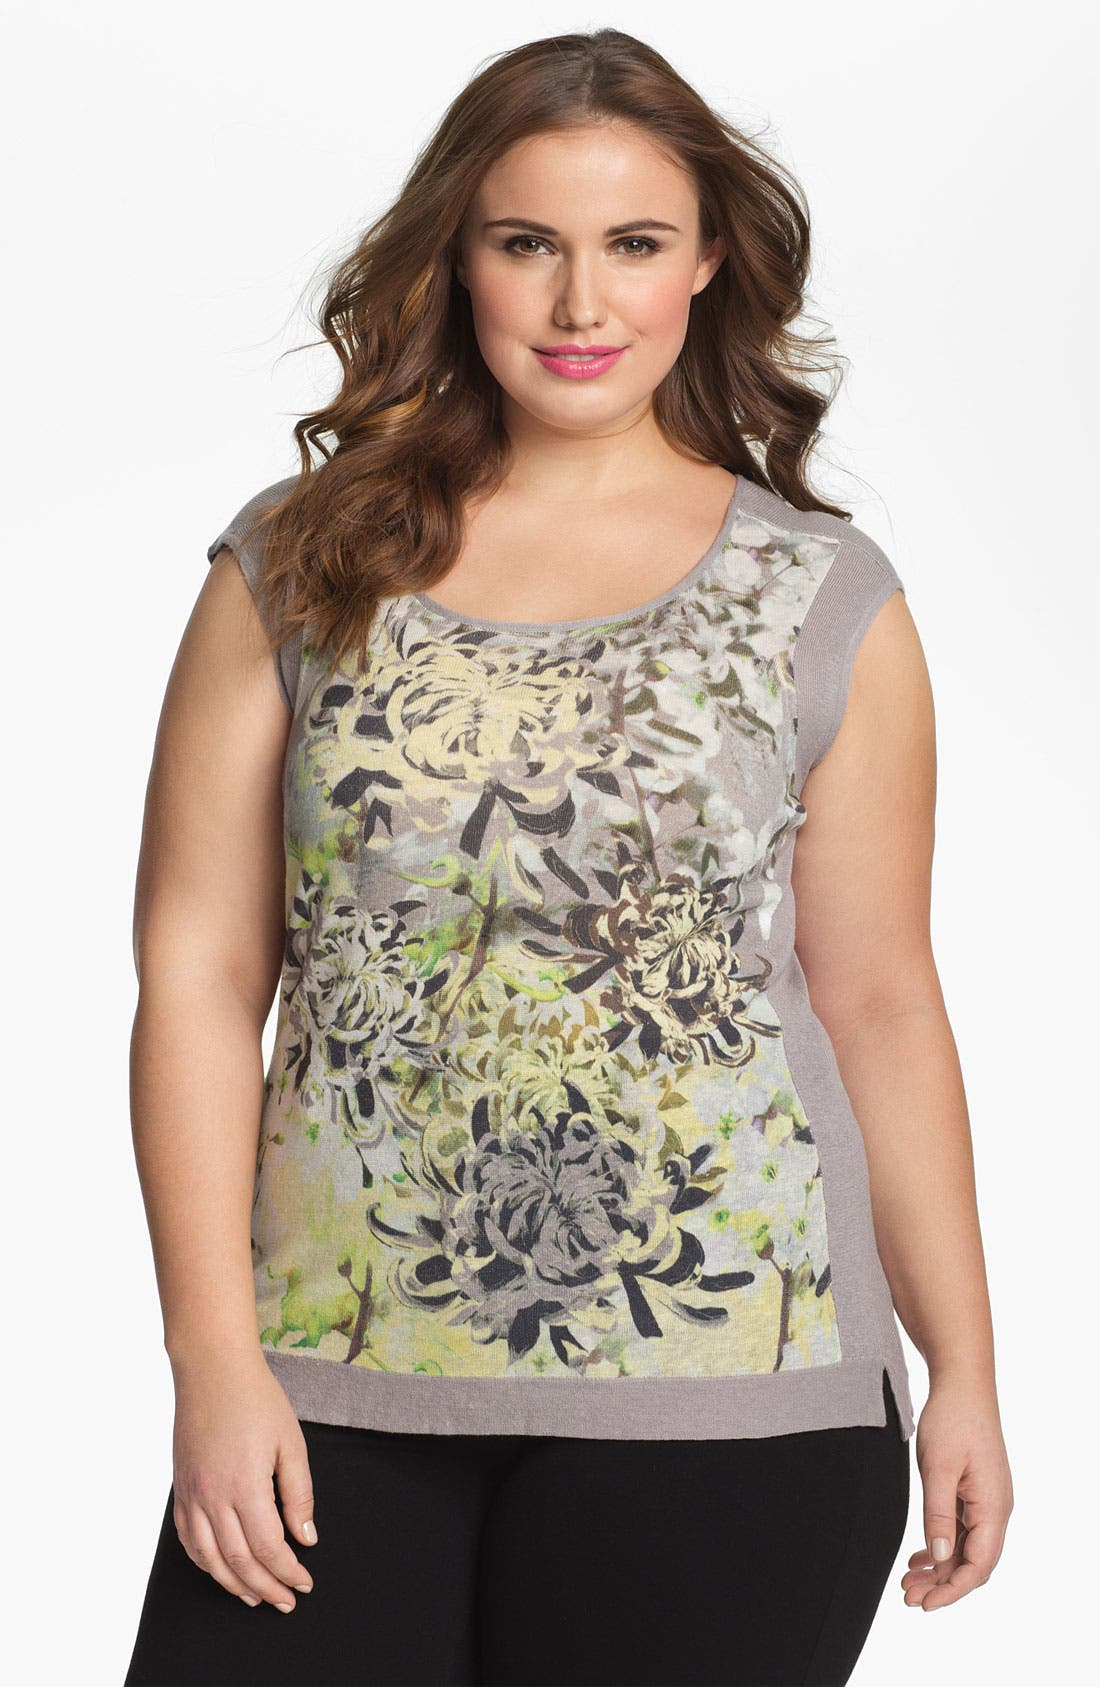 Main Image - Nic + Zoe 'Spring Garden' Print Cap Sleeve Top (Plus Size)